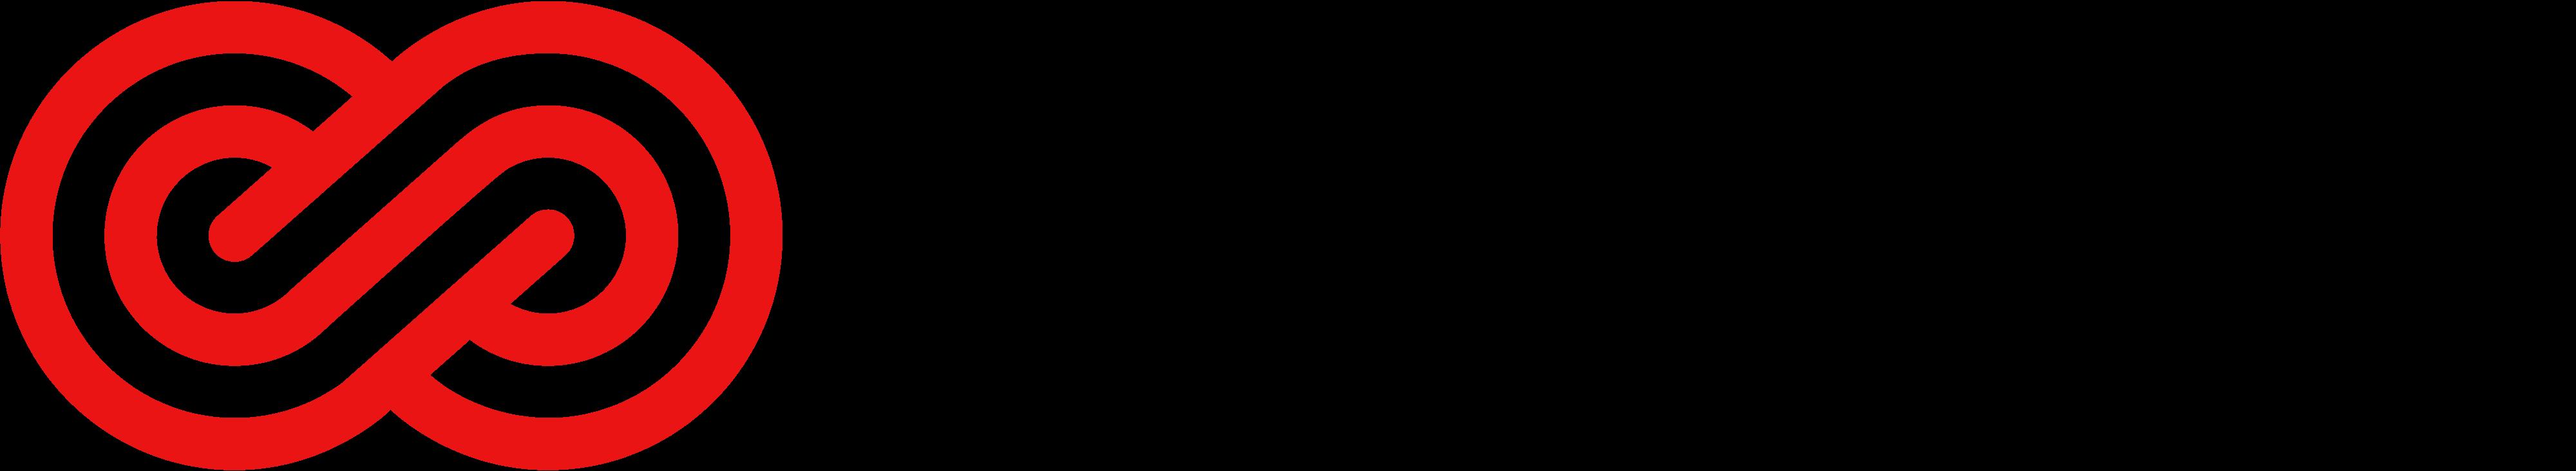 emergn logo